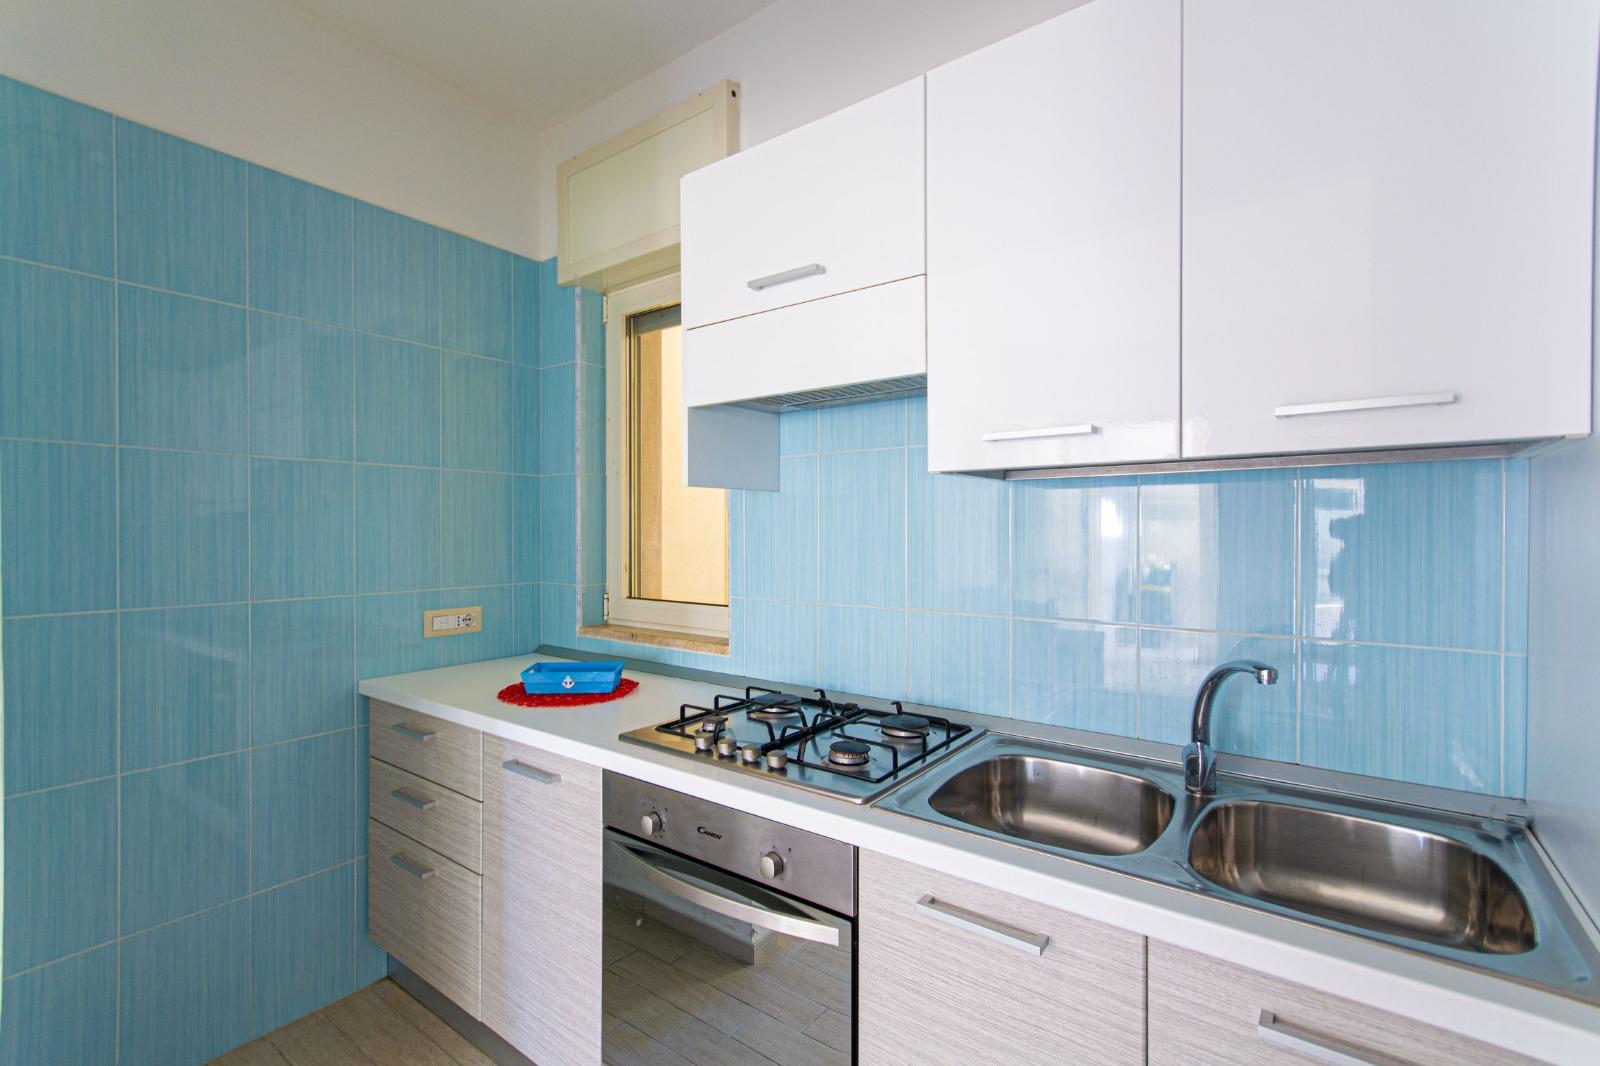 505_appartamento-volta_7._cucinino.jpg